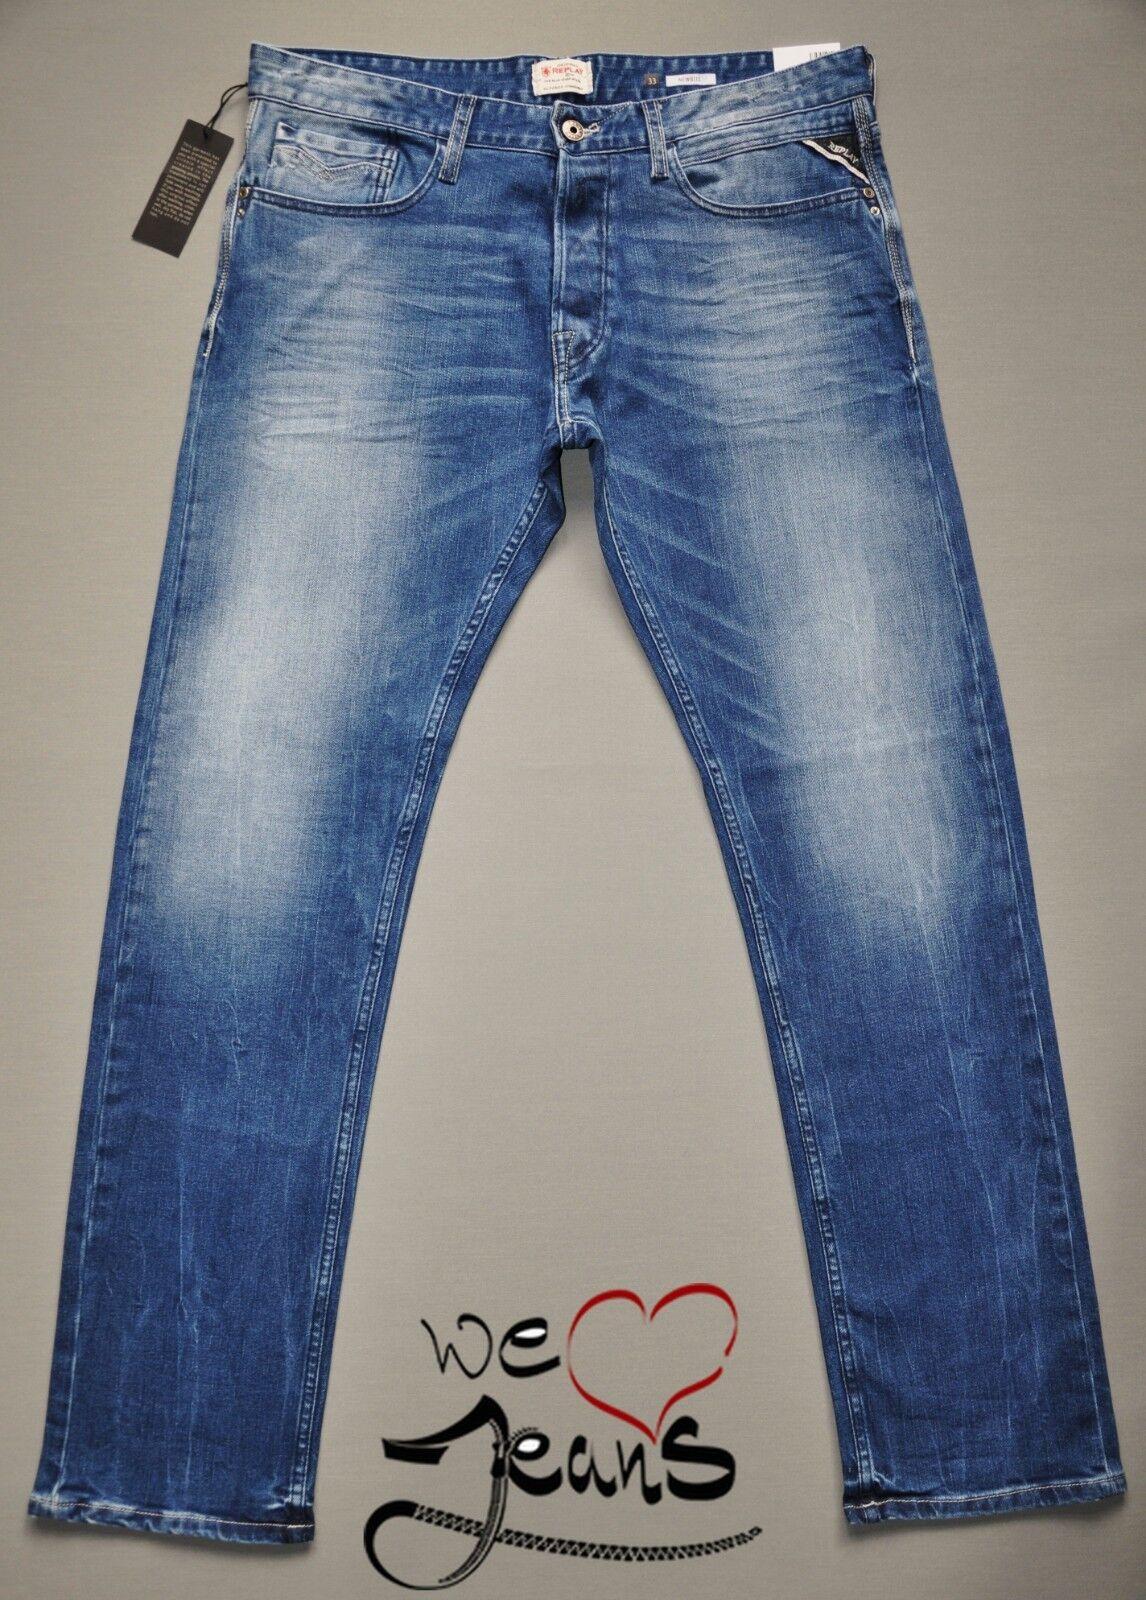 REPLAY NEWBILL M955 010 010 010 Dritto Nuovi Jeans Da Uomo Uomo Pietra stretch blu taglie c40fff